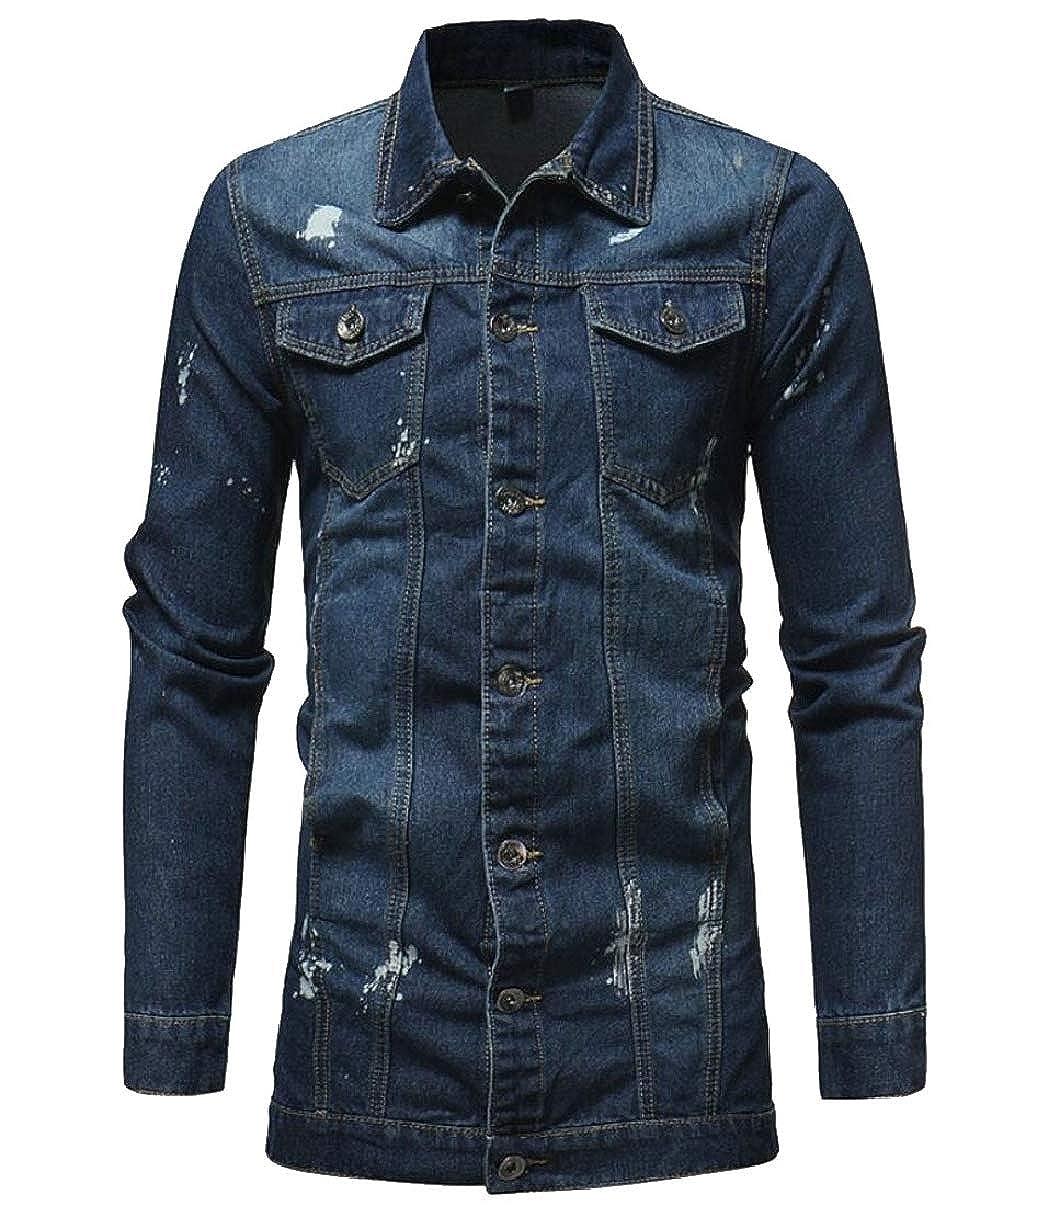 7d34d62fc79e57 Dark blueee LEISHOP LEISHOP LEISHOP Men Fashion Slim Button Front Faded  Washed Jean Denim Jacket Coat e5786e